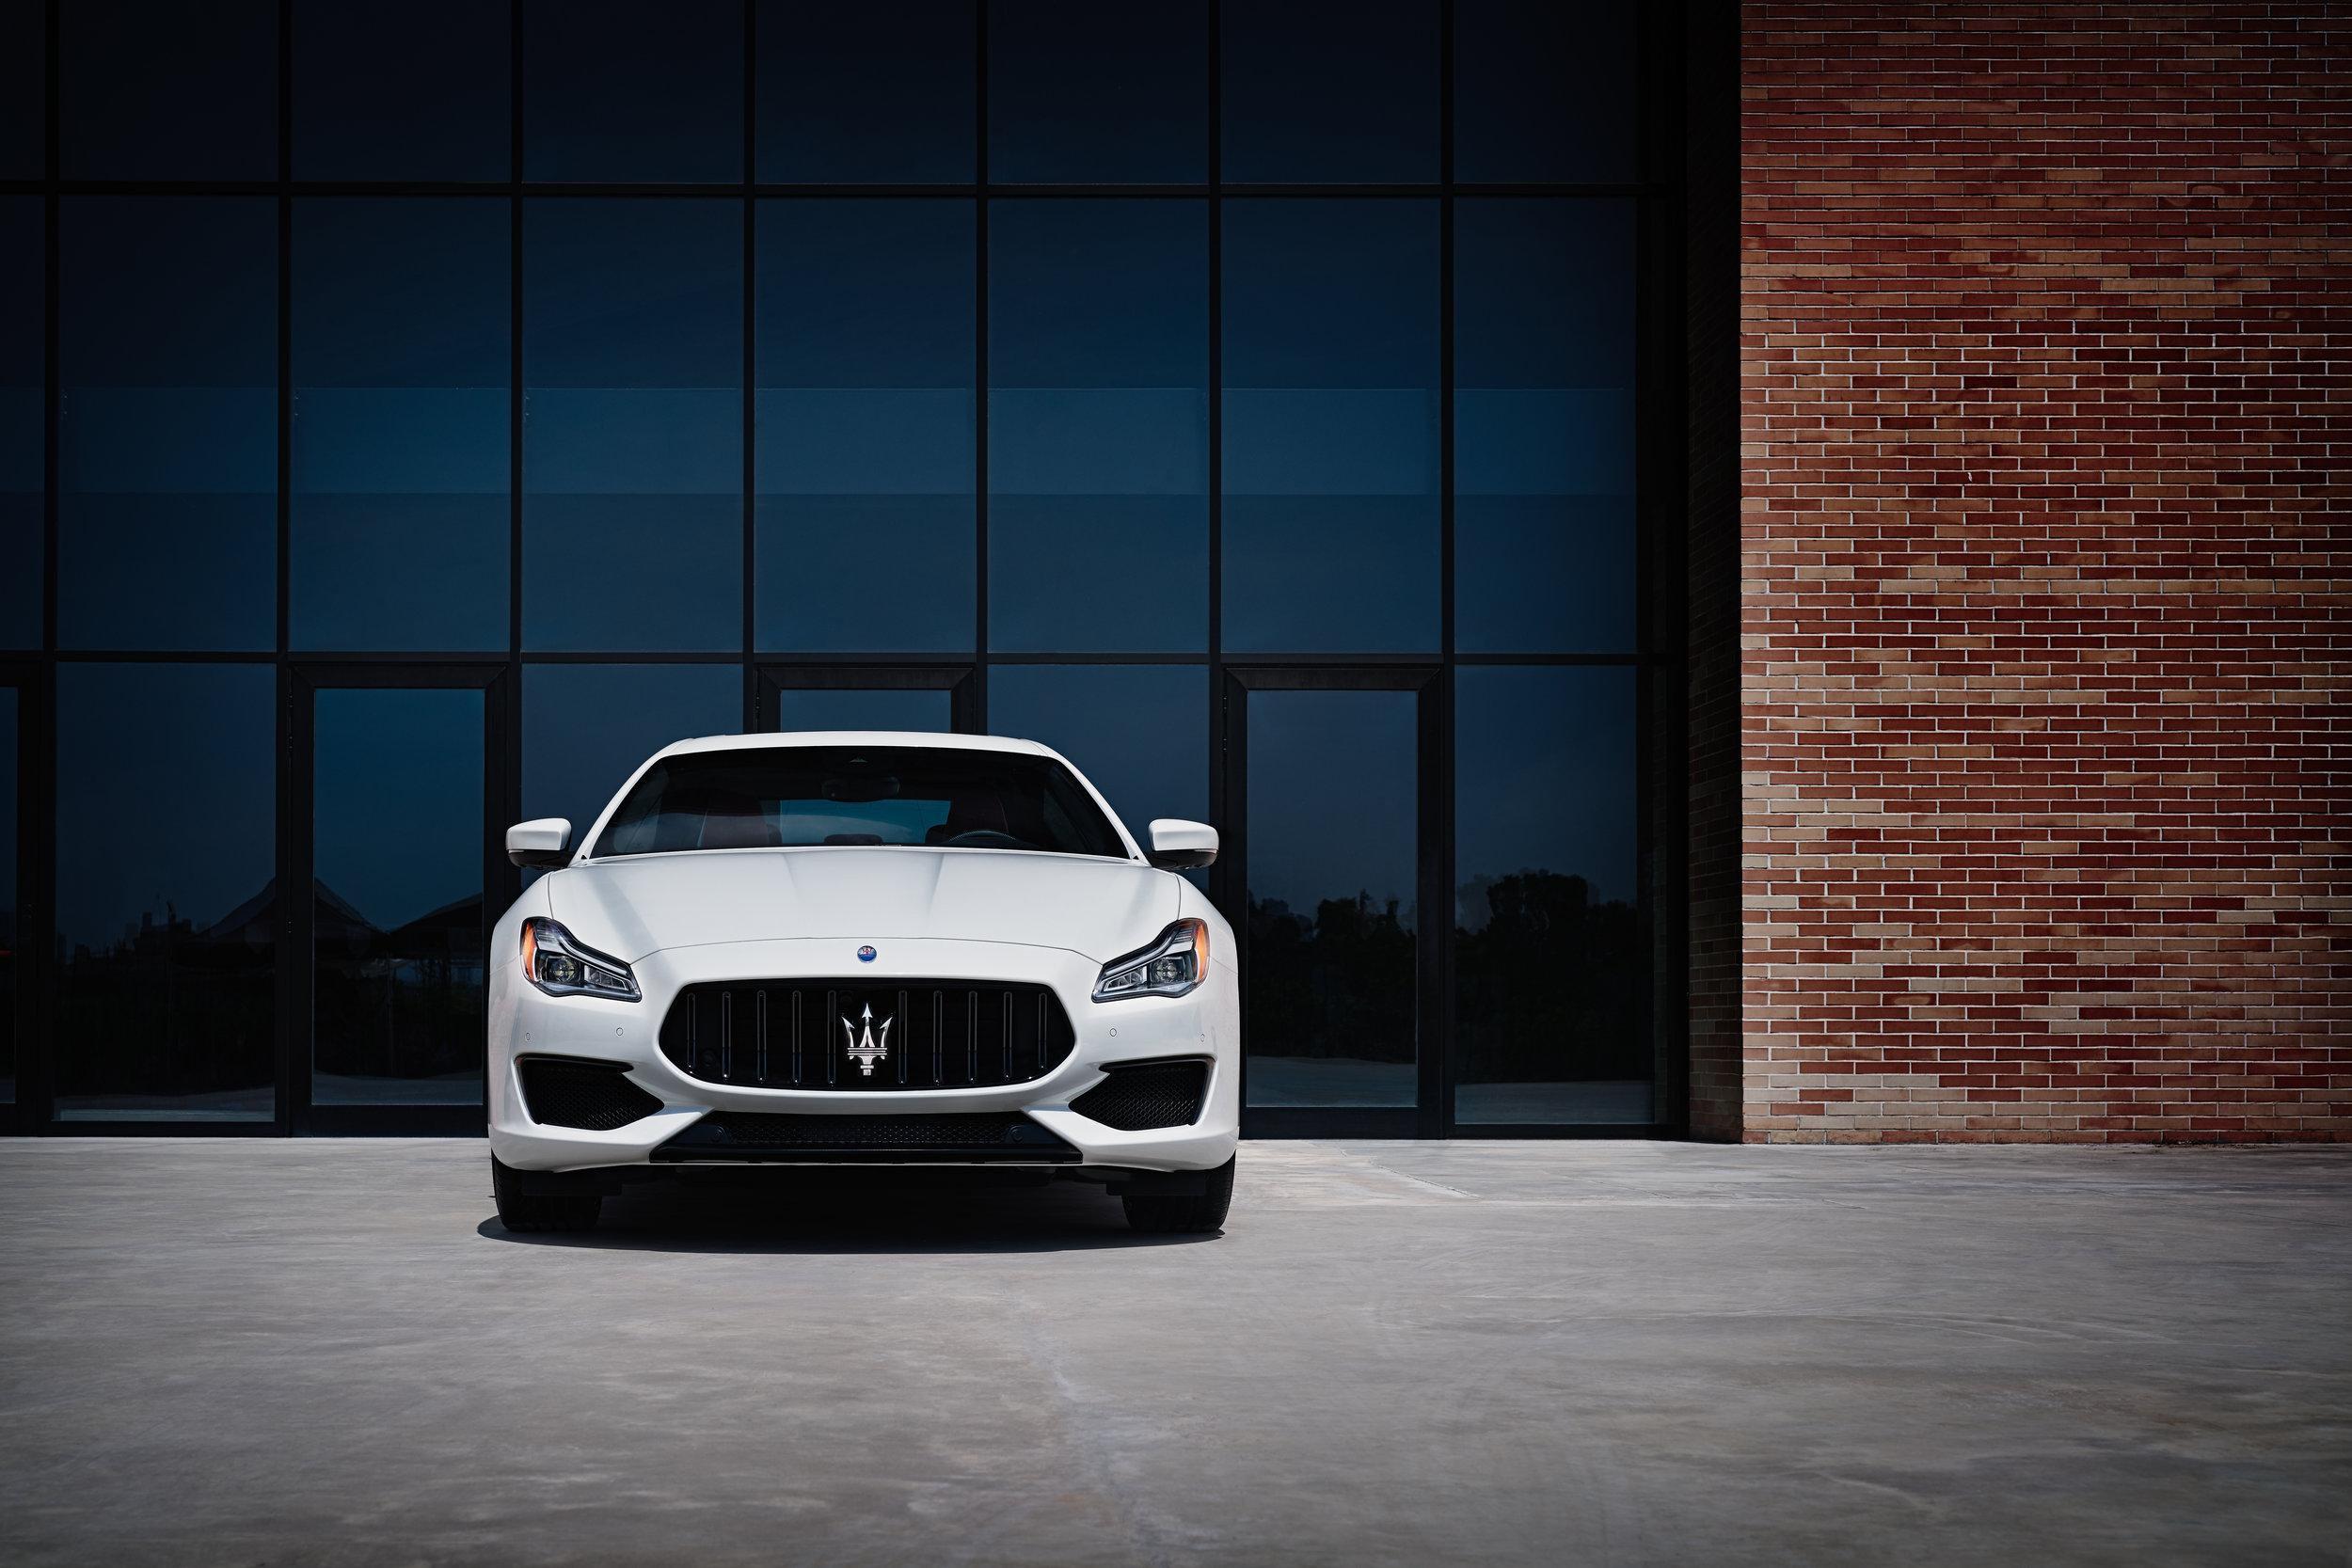 Large-14890-MaseratiQuattroporteGTSMY19GranSport.jpg